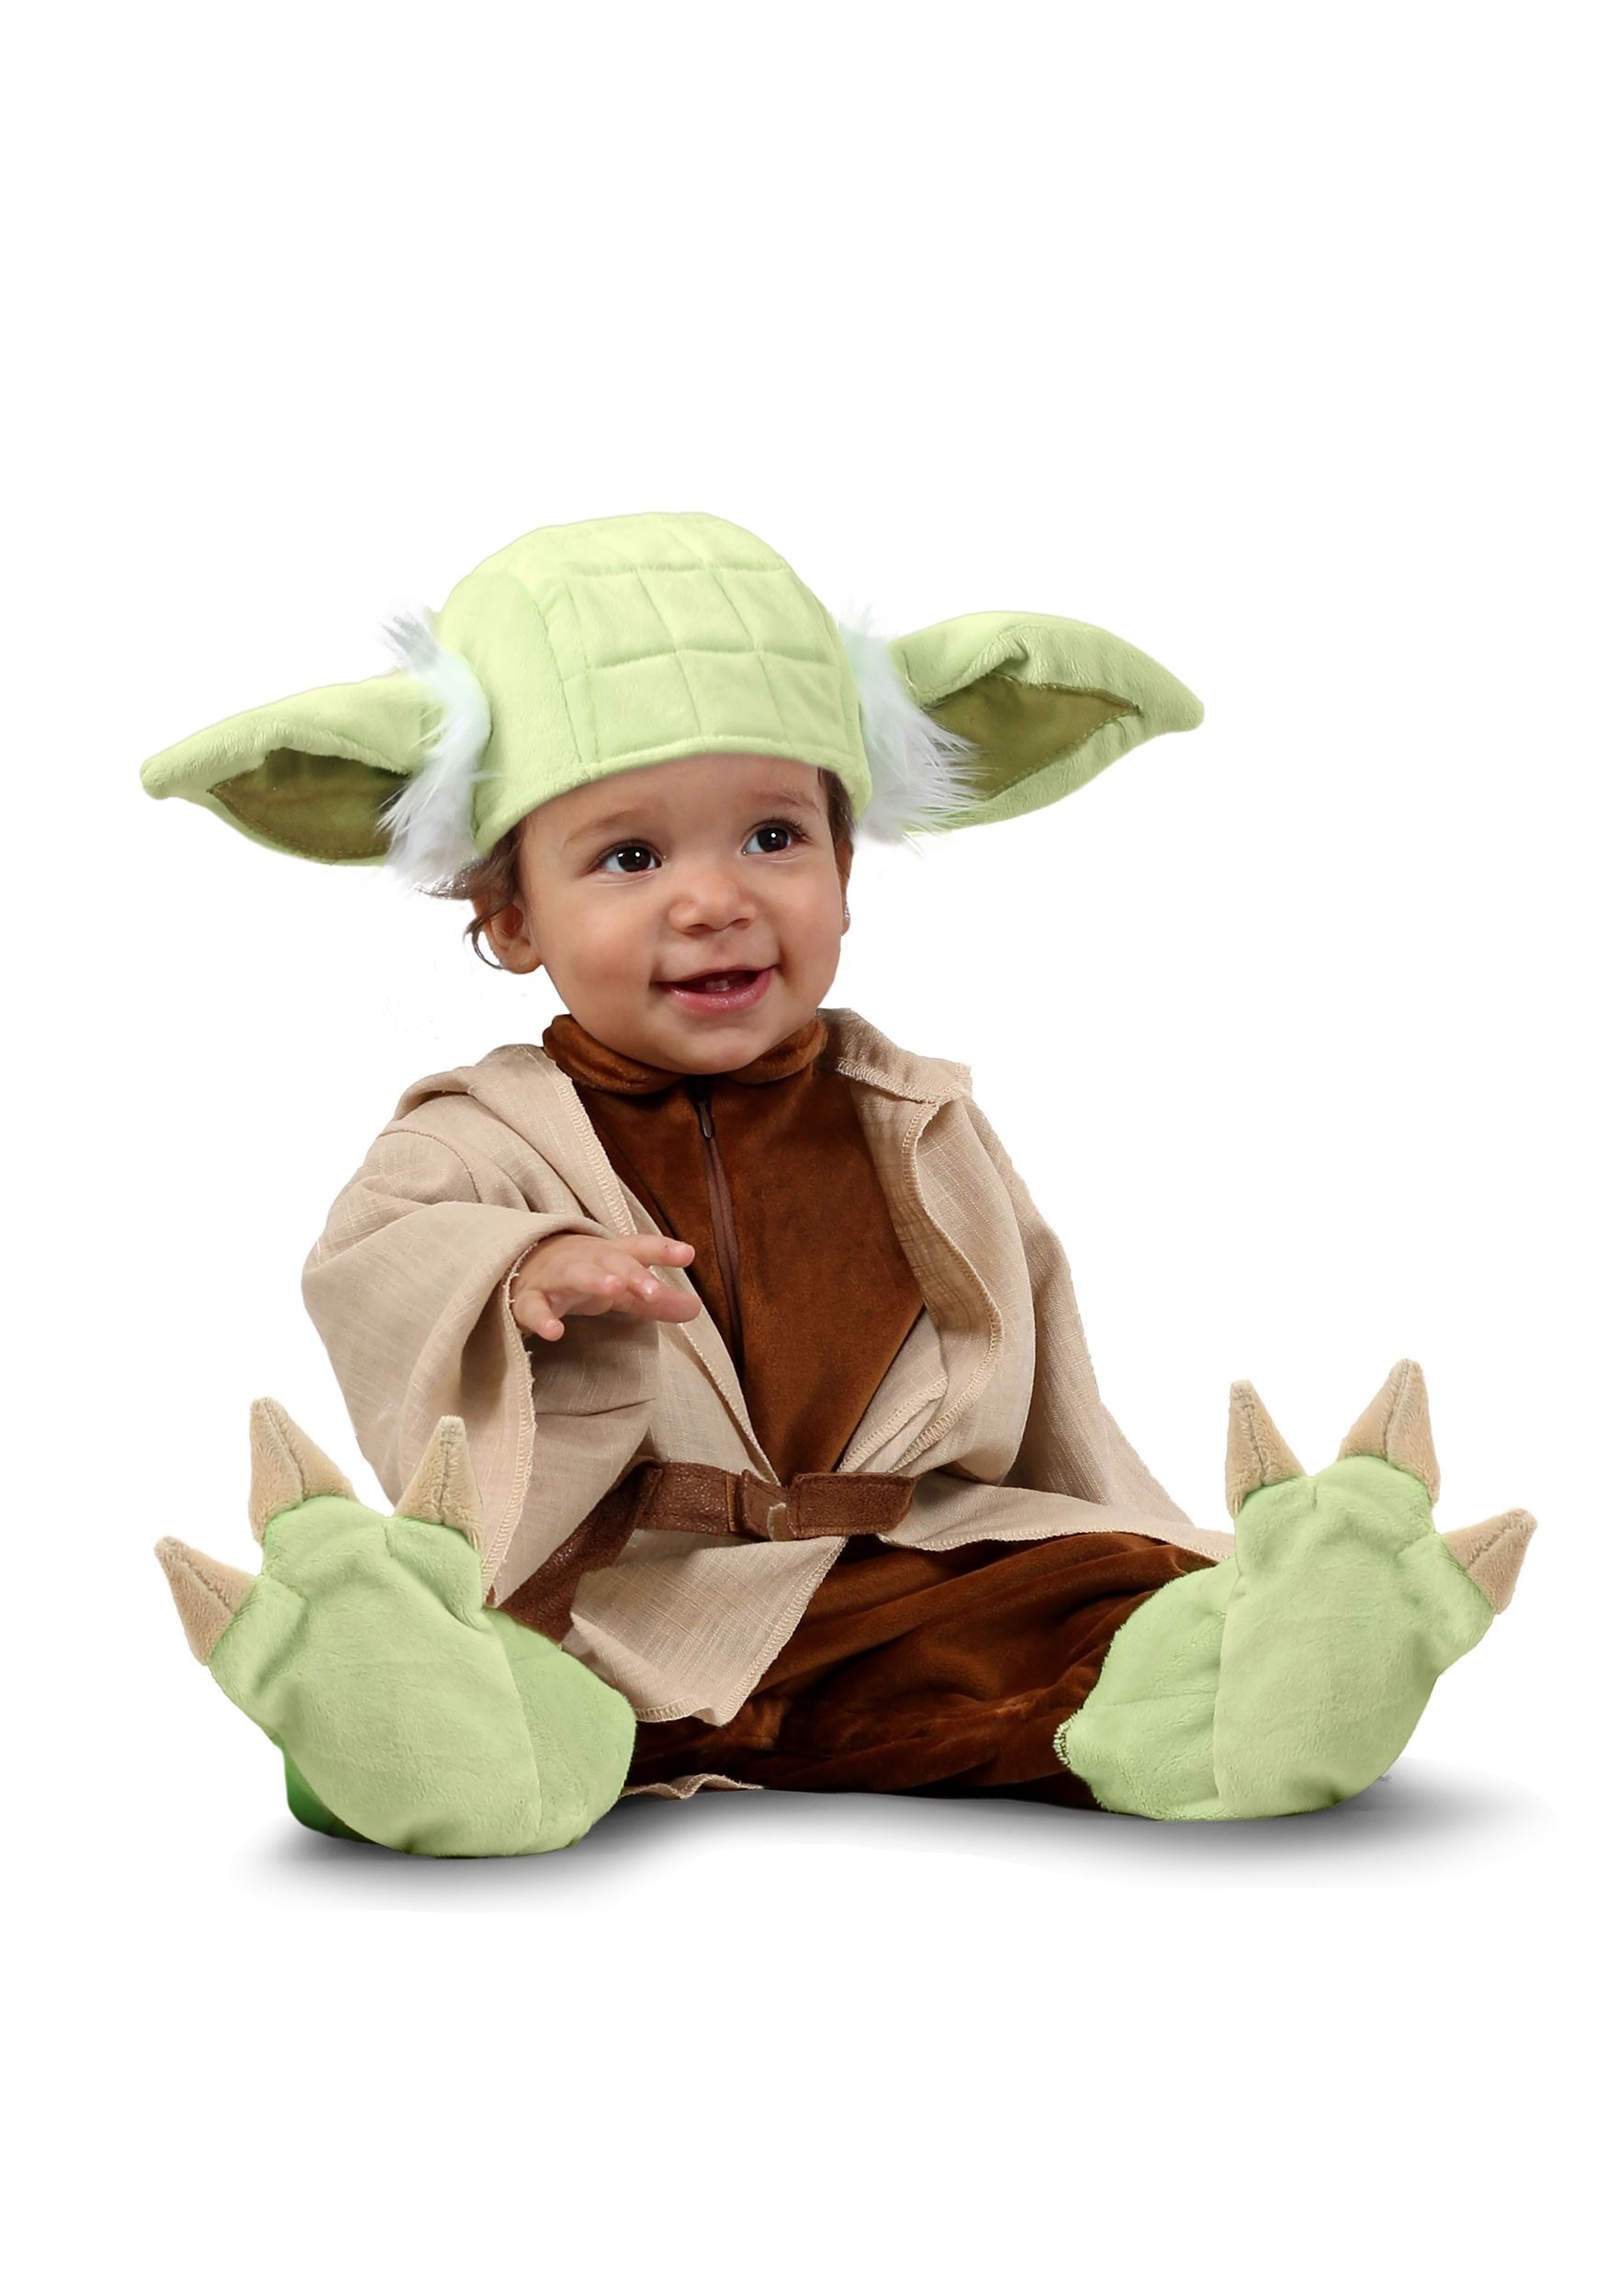 Baby Star Wars Yoda Costume